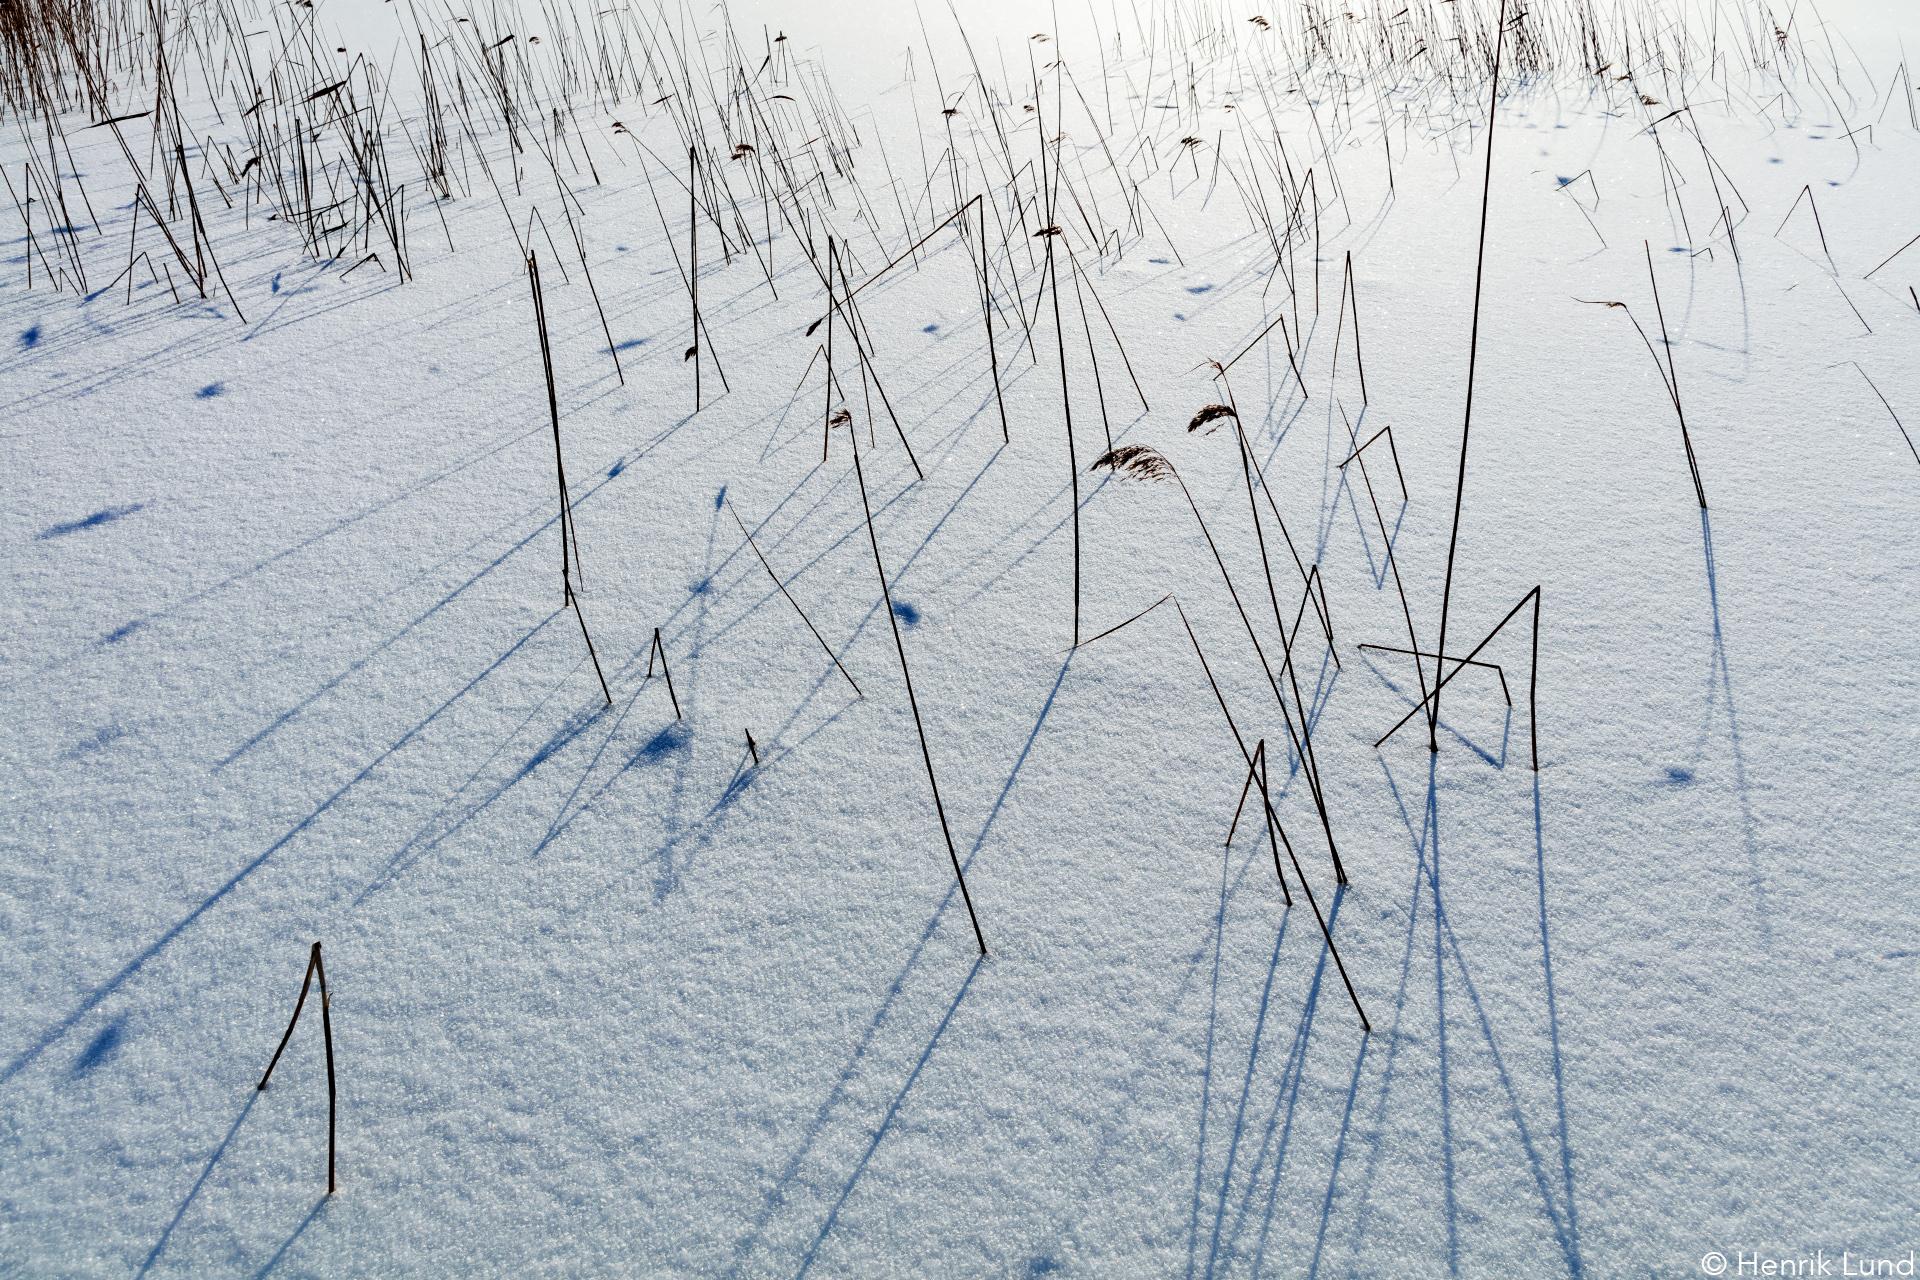 Reeds and shadows. Lappträsk, Finland. February 2017.